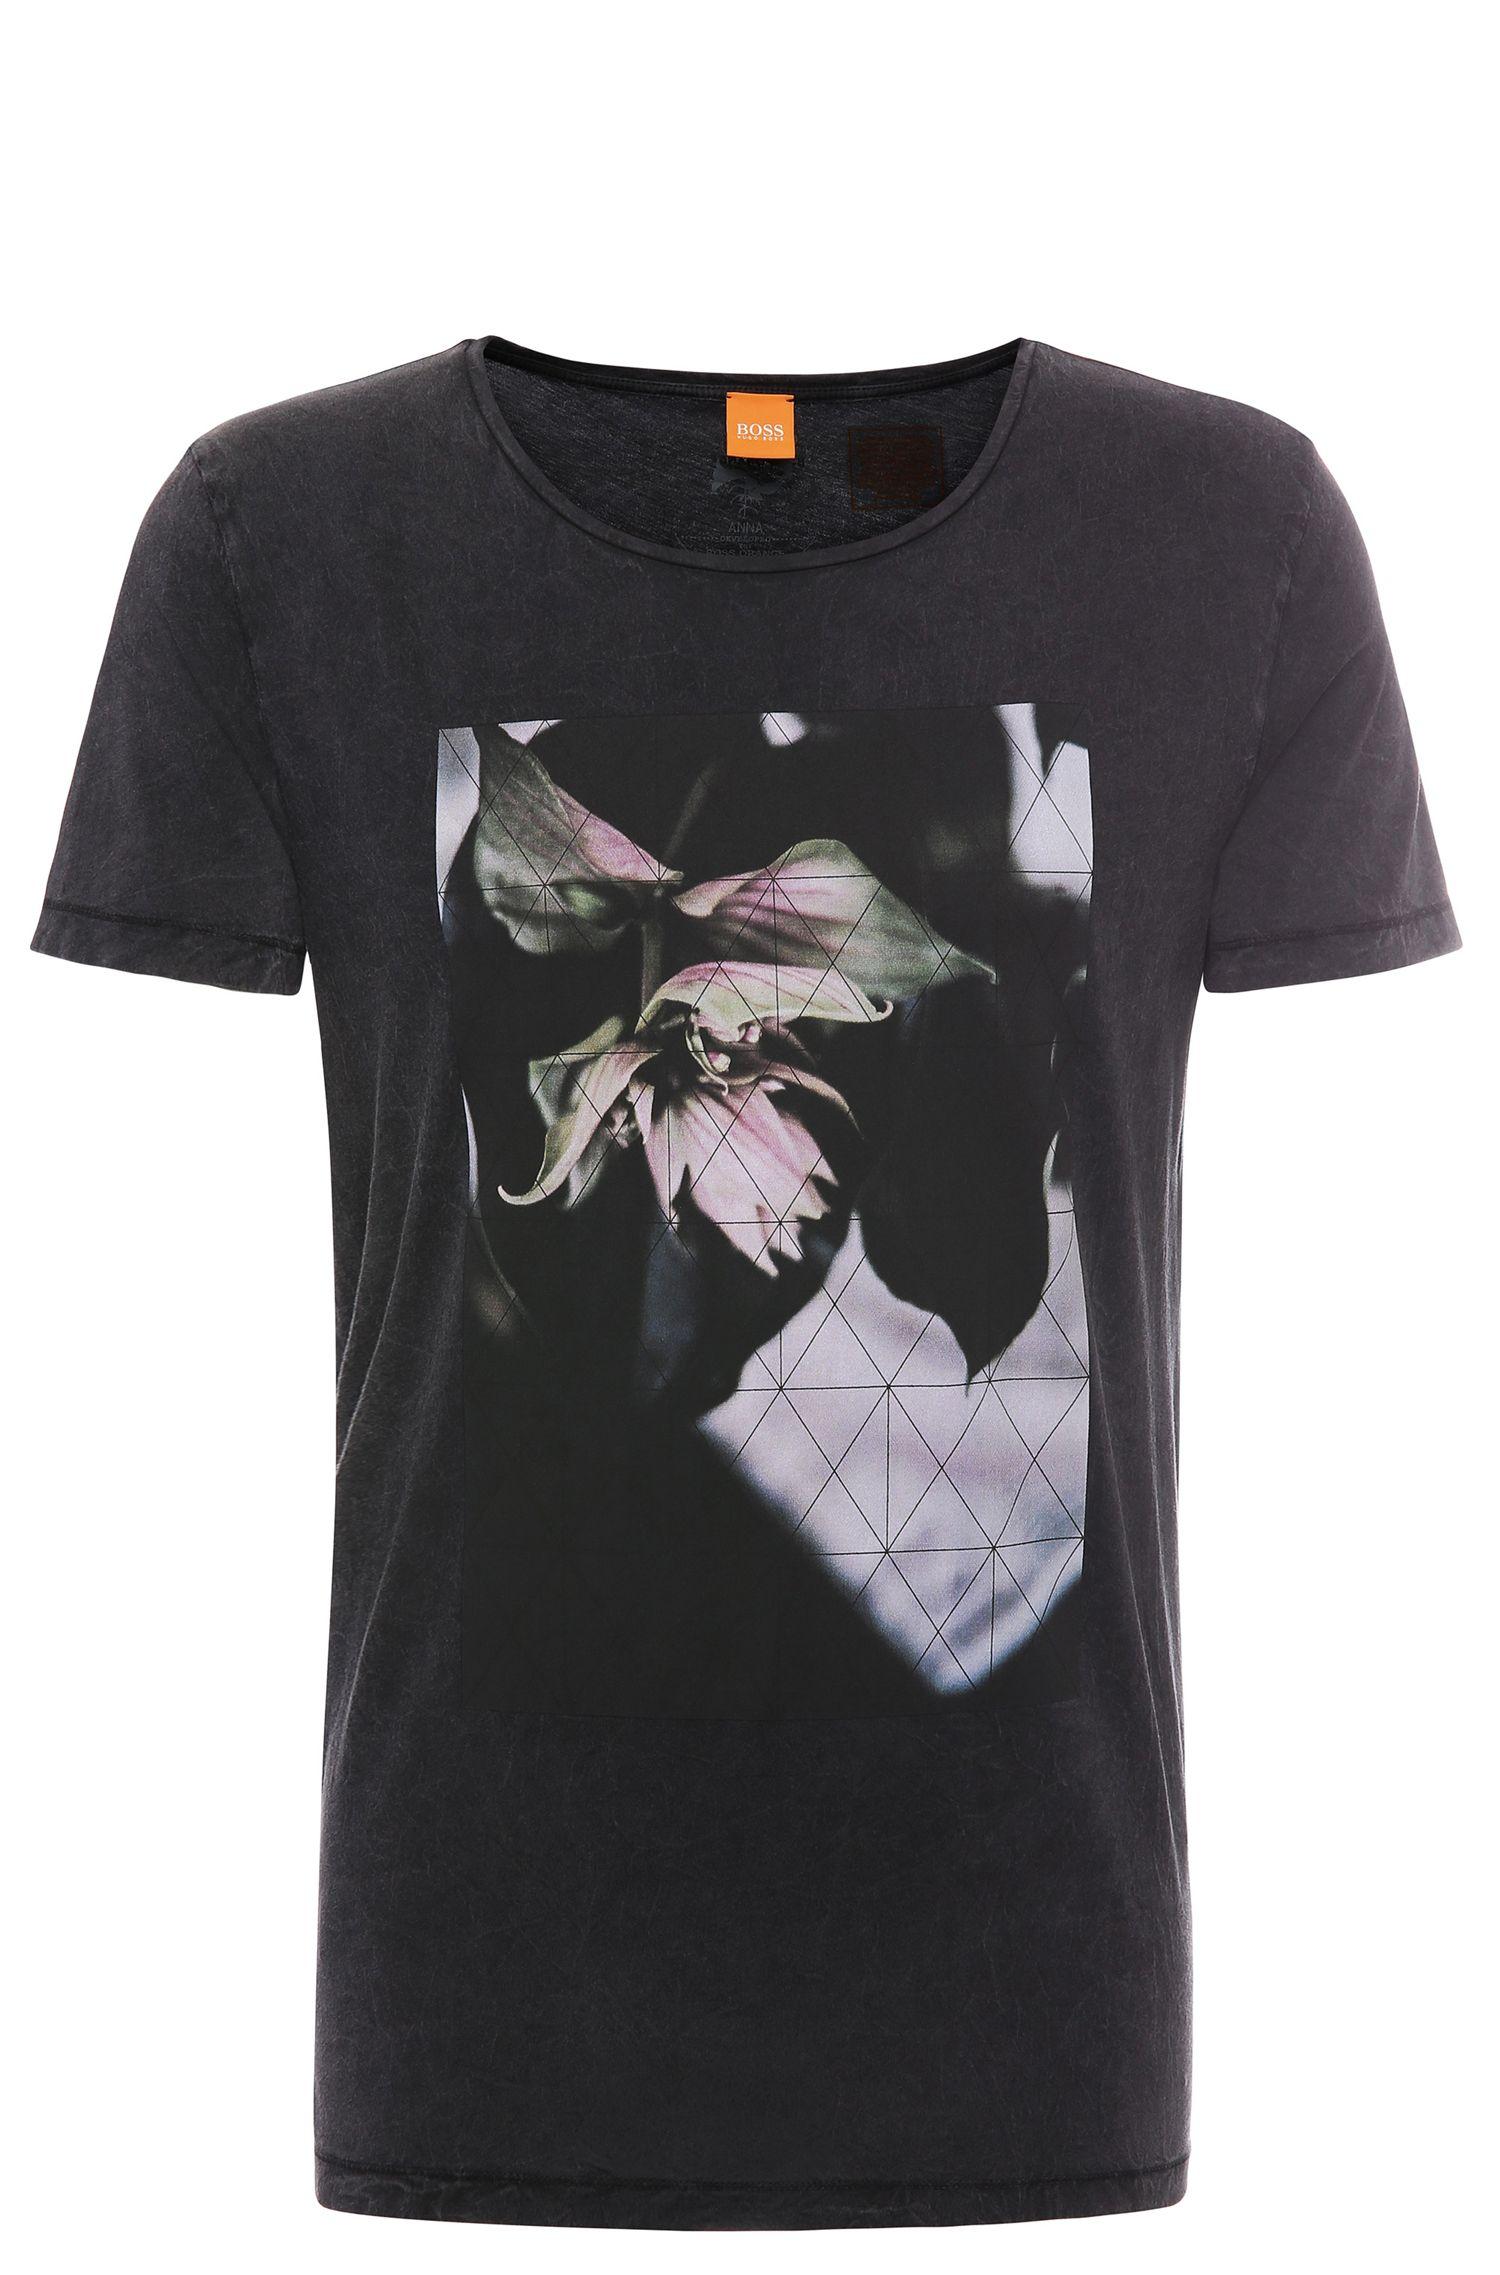 'Torvind' | Cotton Lily Print T-Shirt